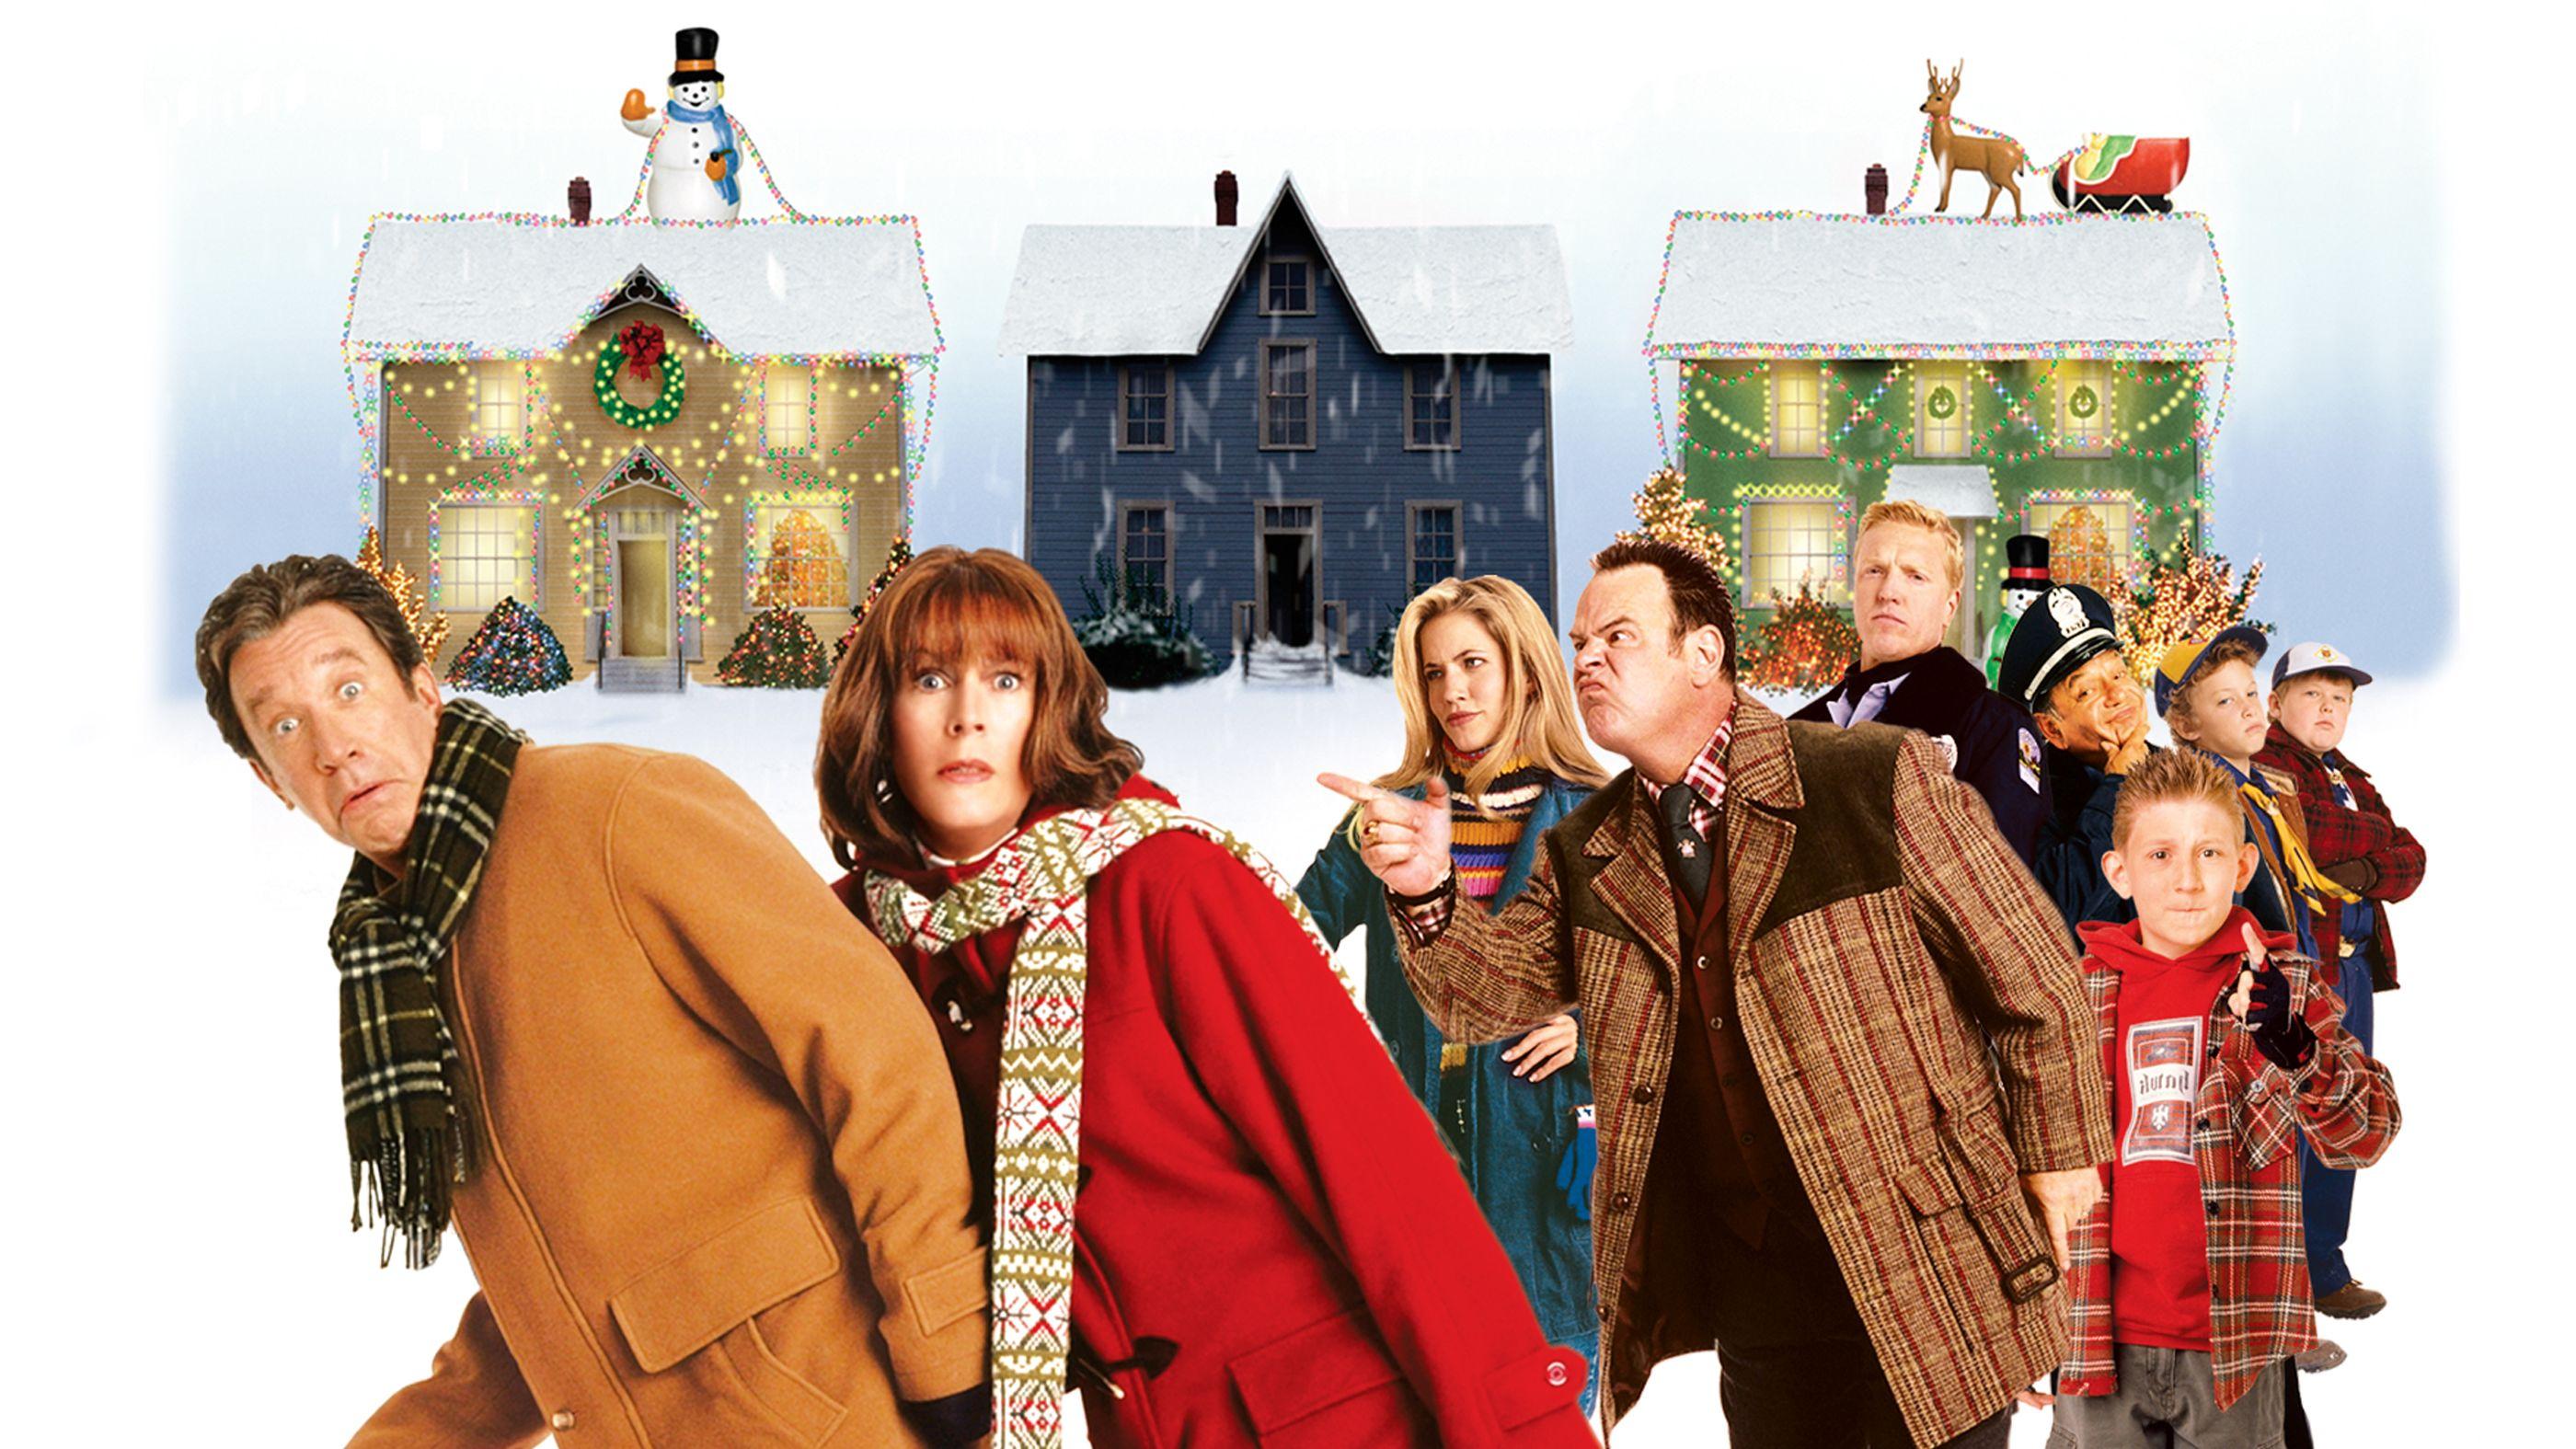 Christmas With The Kranks 2.Christmas With The Kranks Trailer